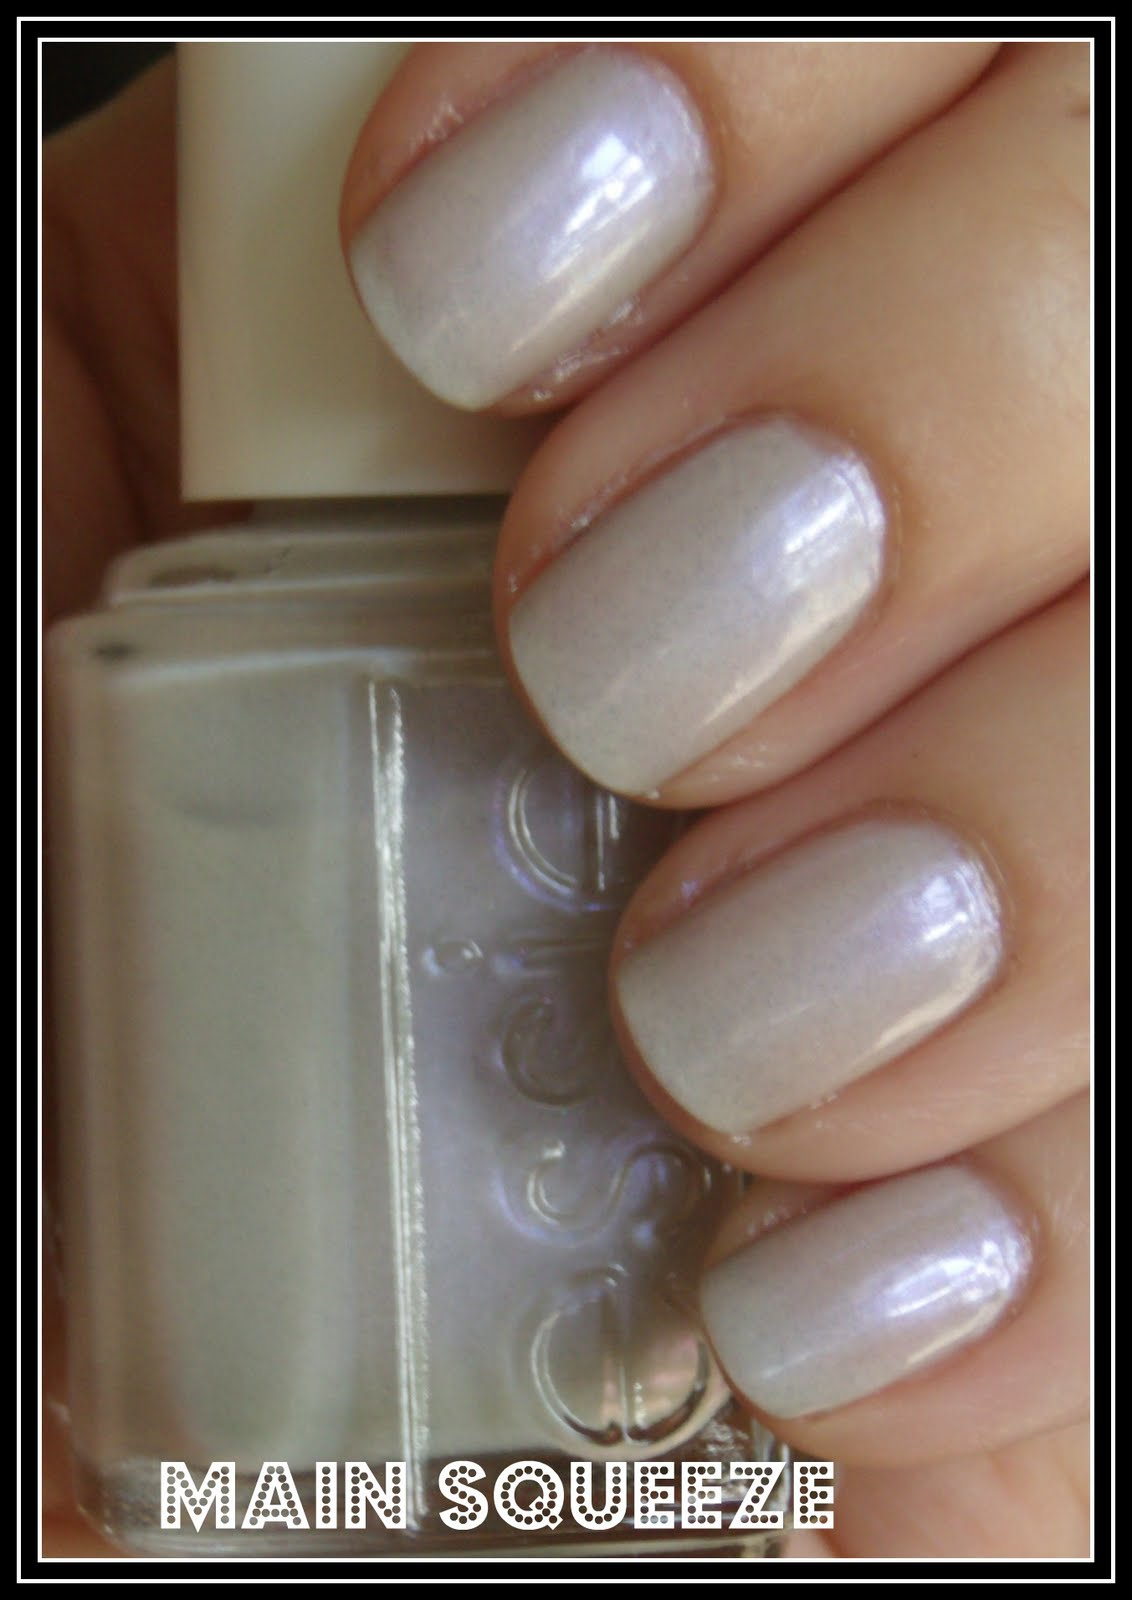 Obsessive Cosmetic Hoarders Unite!: Nail Polish of the Day: Essie ...